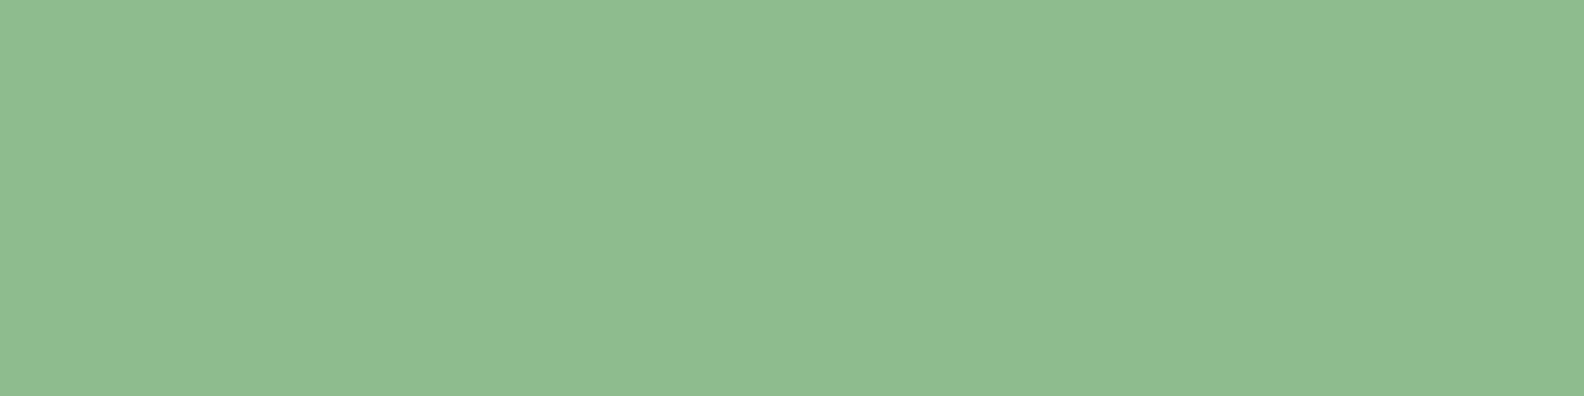 1584x396 Dark Sea Green Solid Color Background